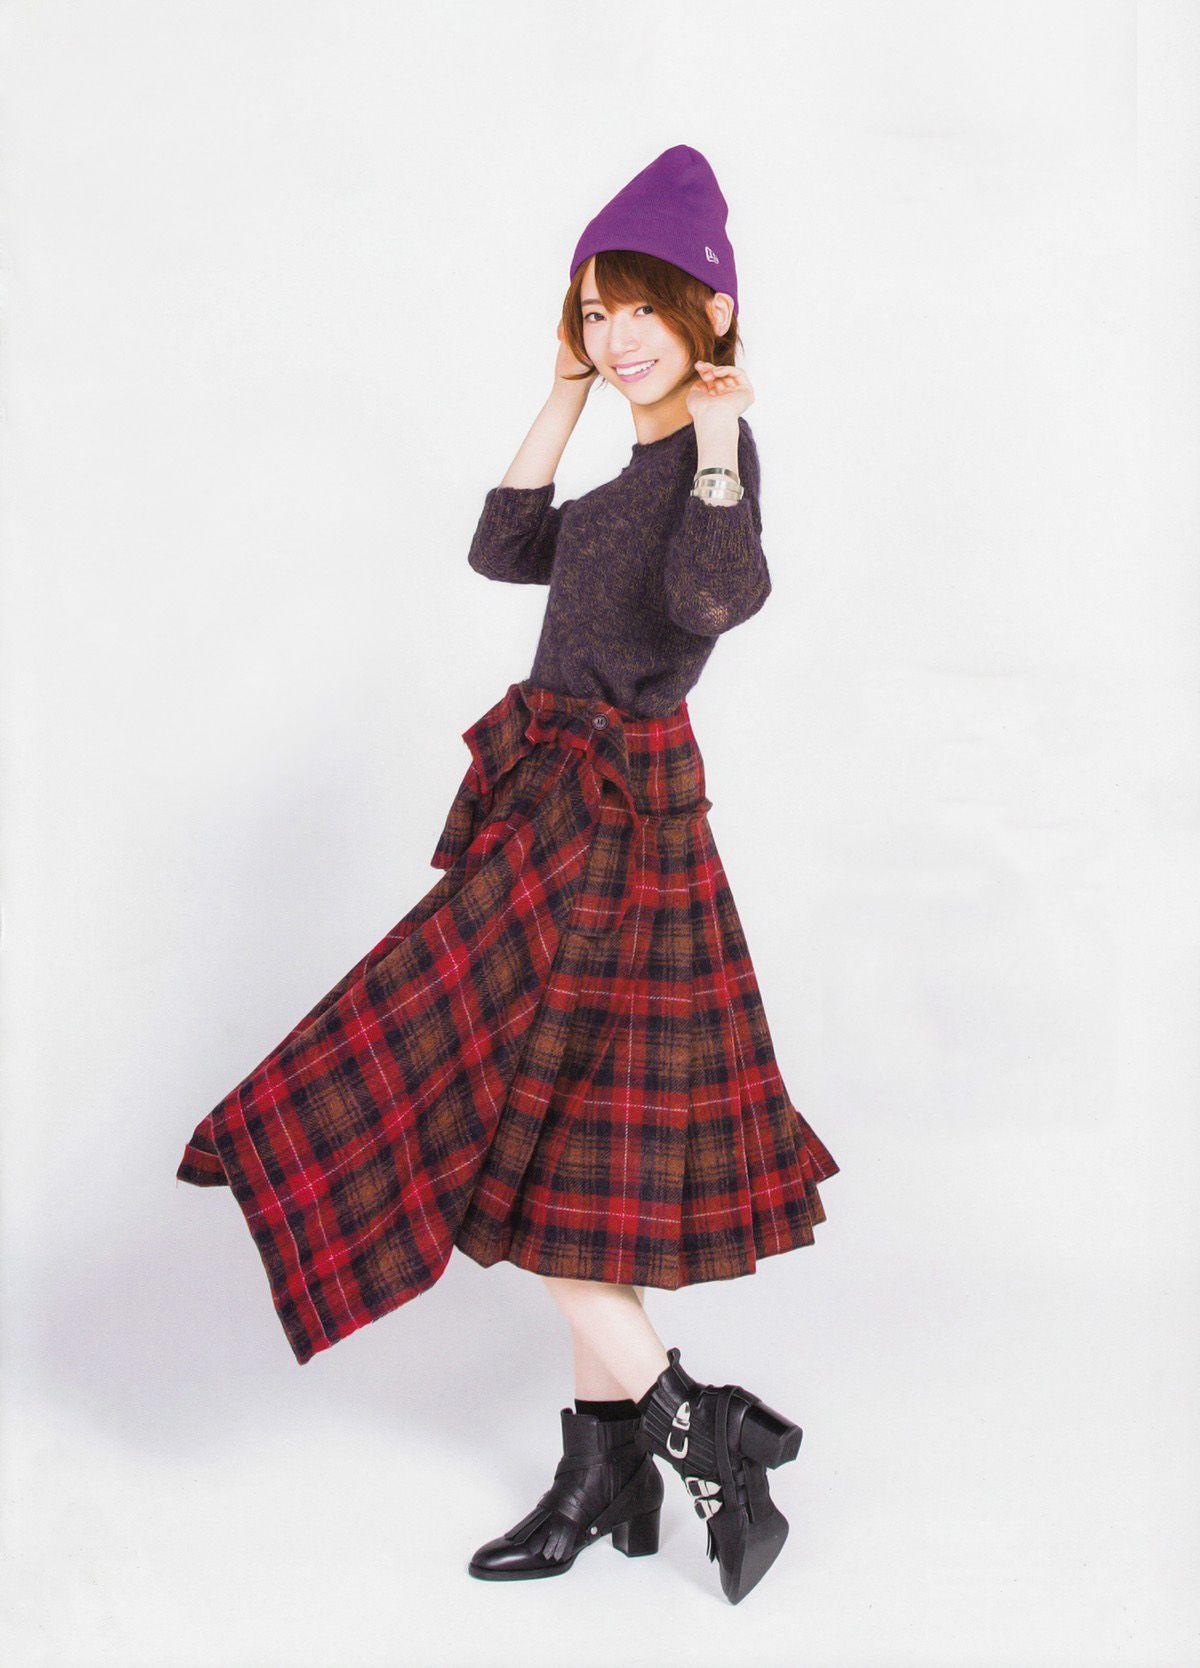 akb48wallpapers:  Nanami Hashimoto